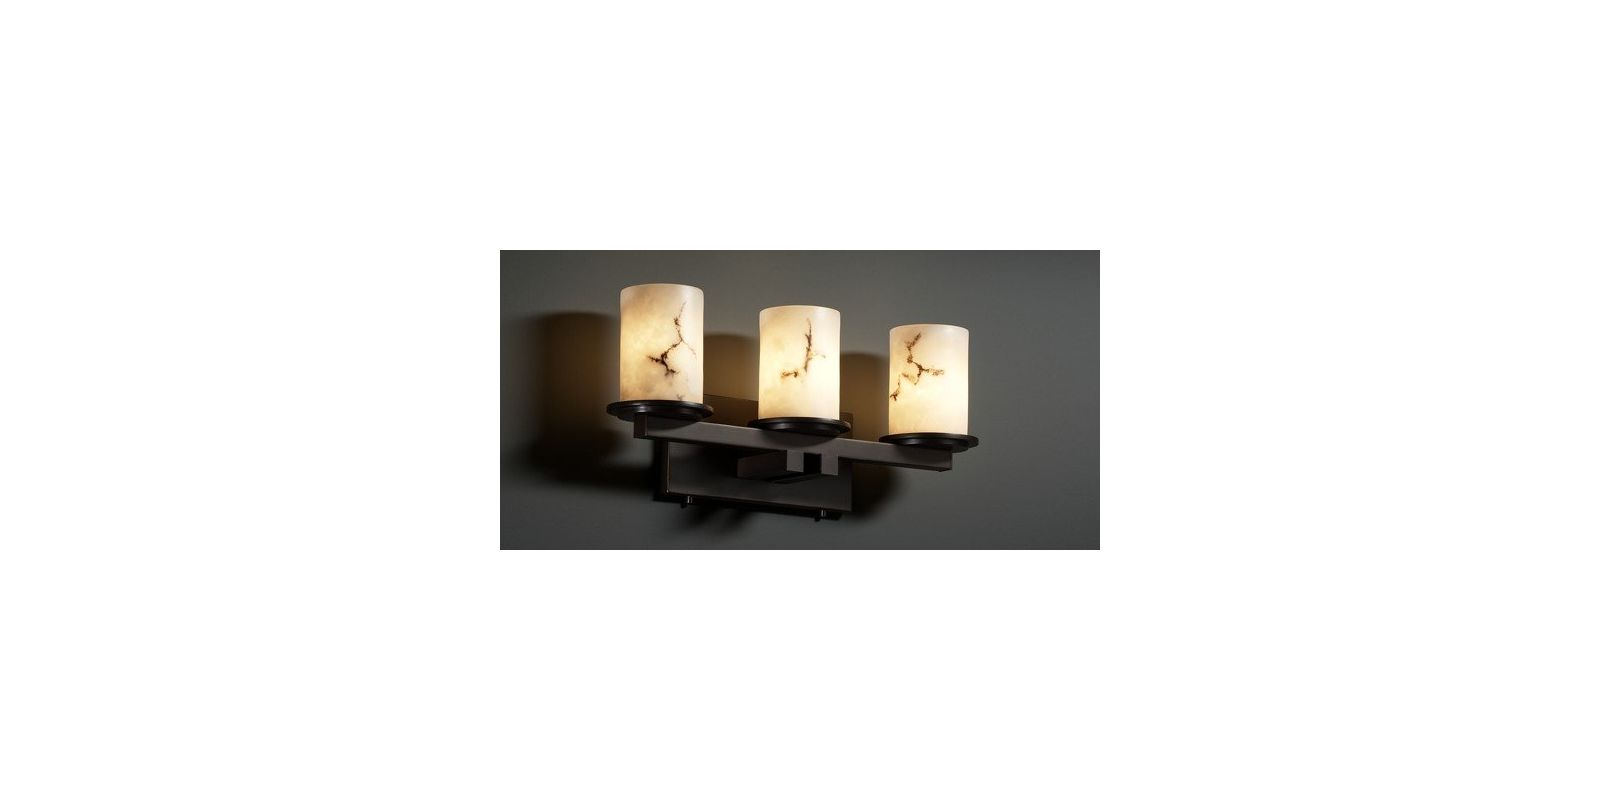 Fal 8773 10 dbrz in dark bronze by justice design group - Justice design group bathroom lighting ...